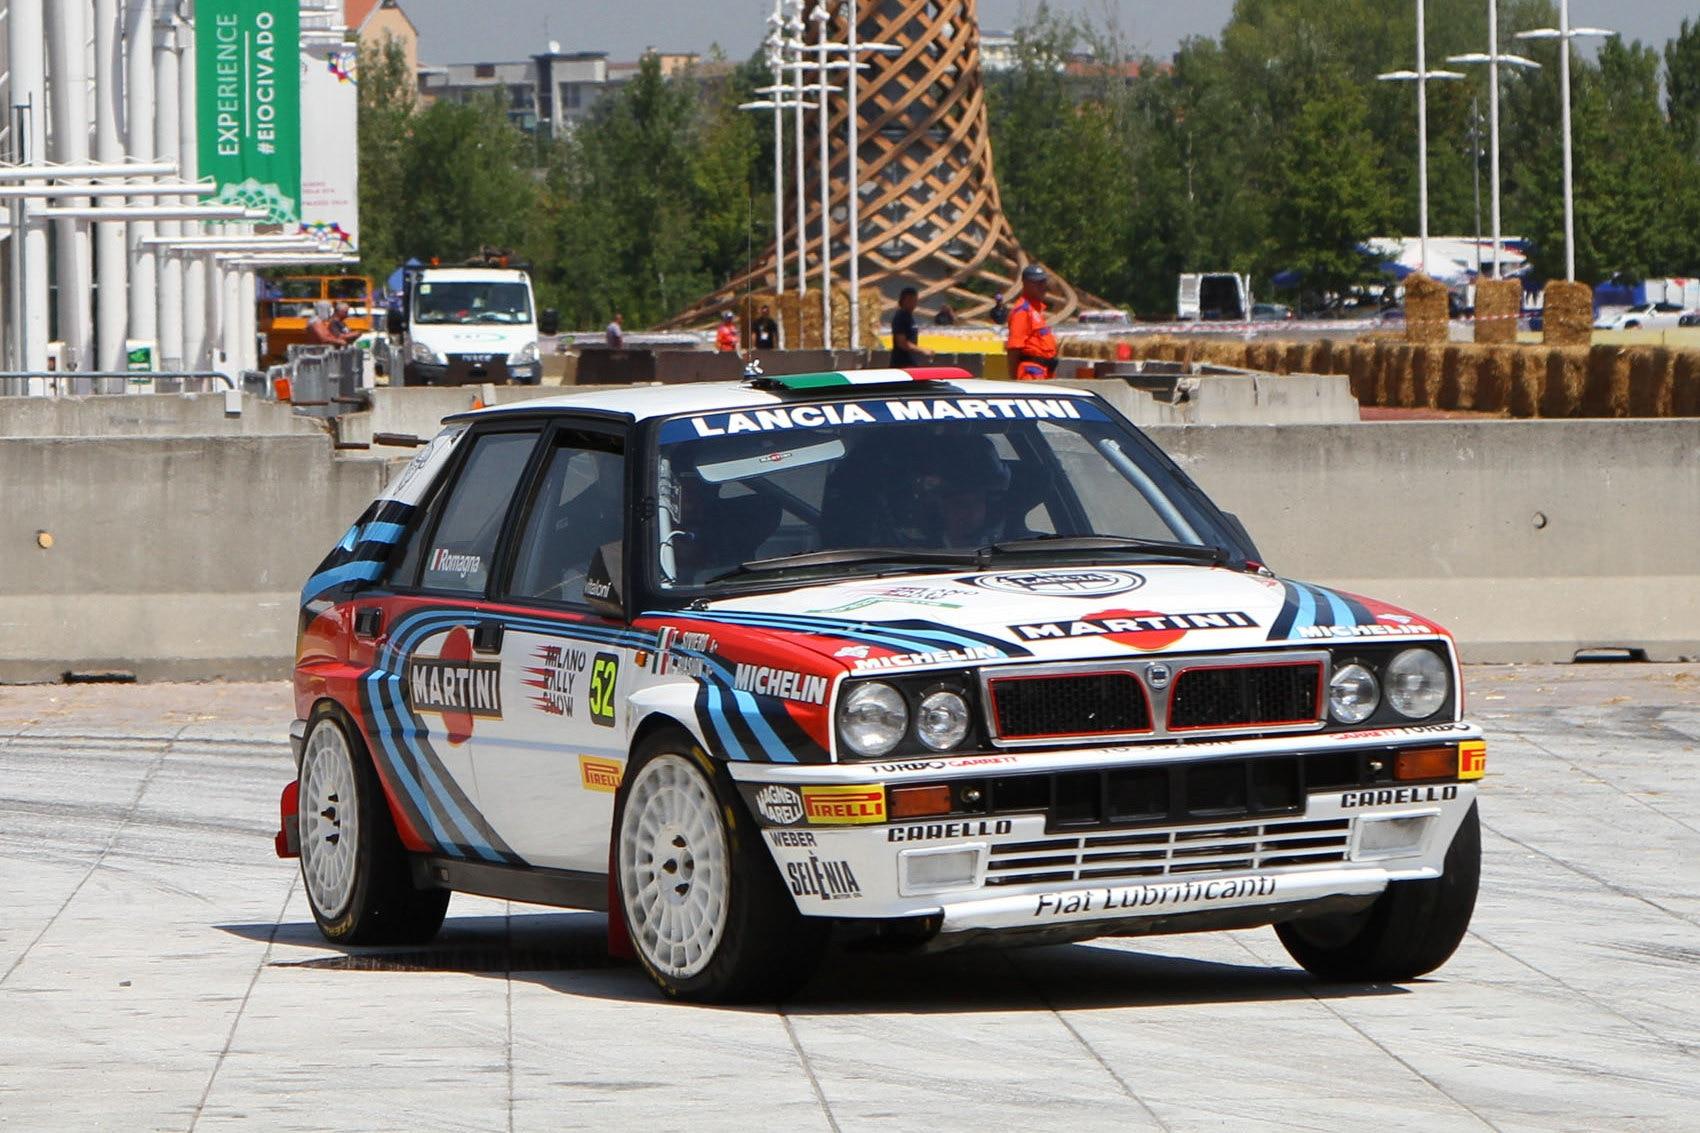 milano-rally-show-2017_romagna_Lancia-delta-integrale